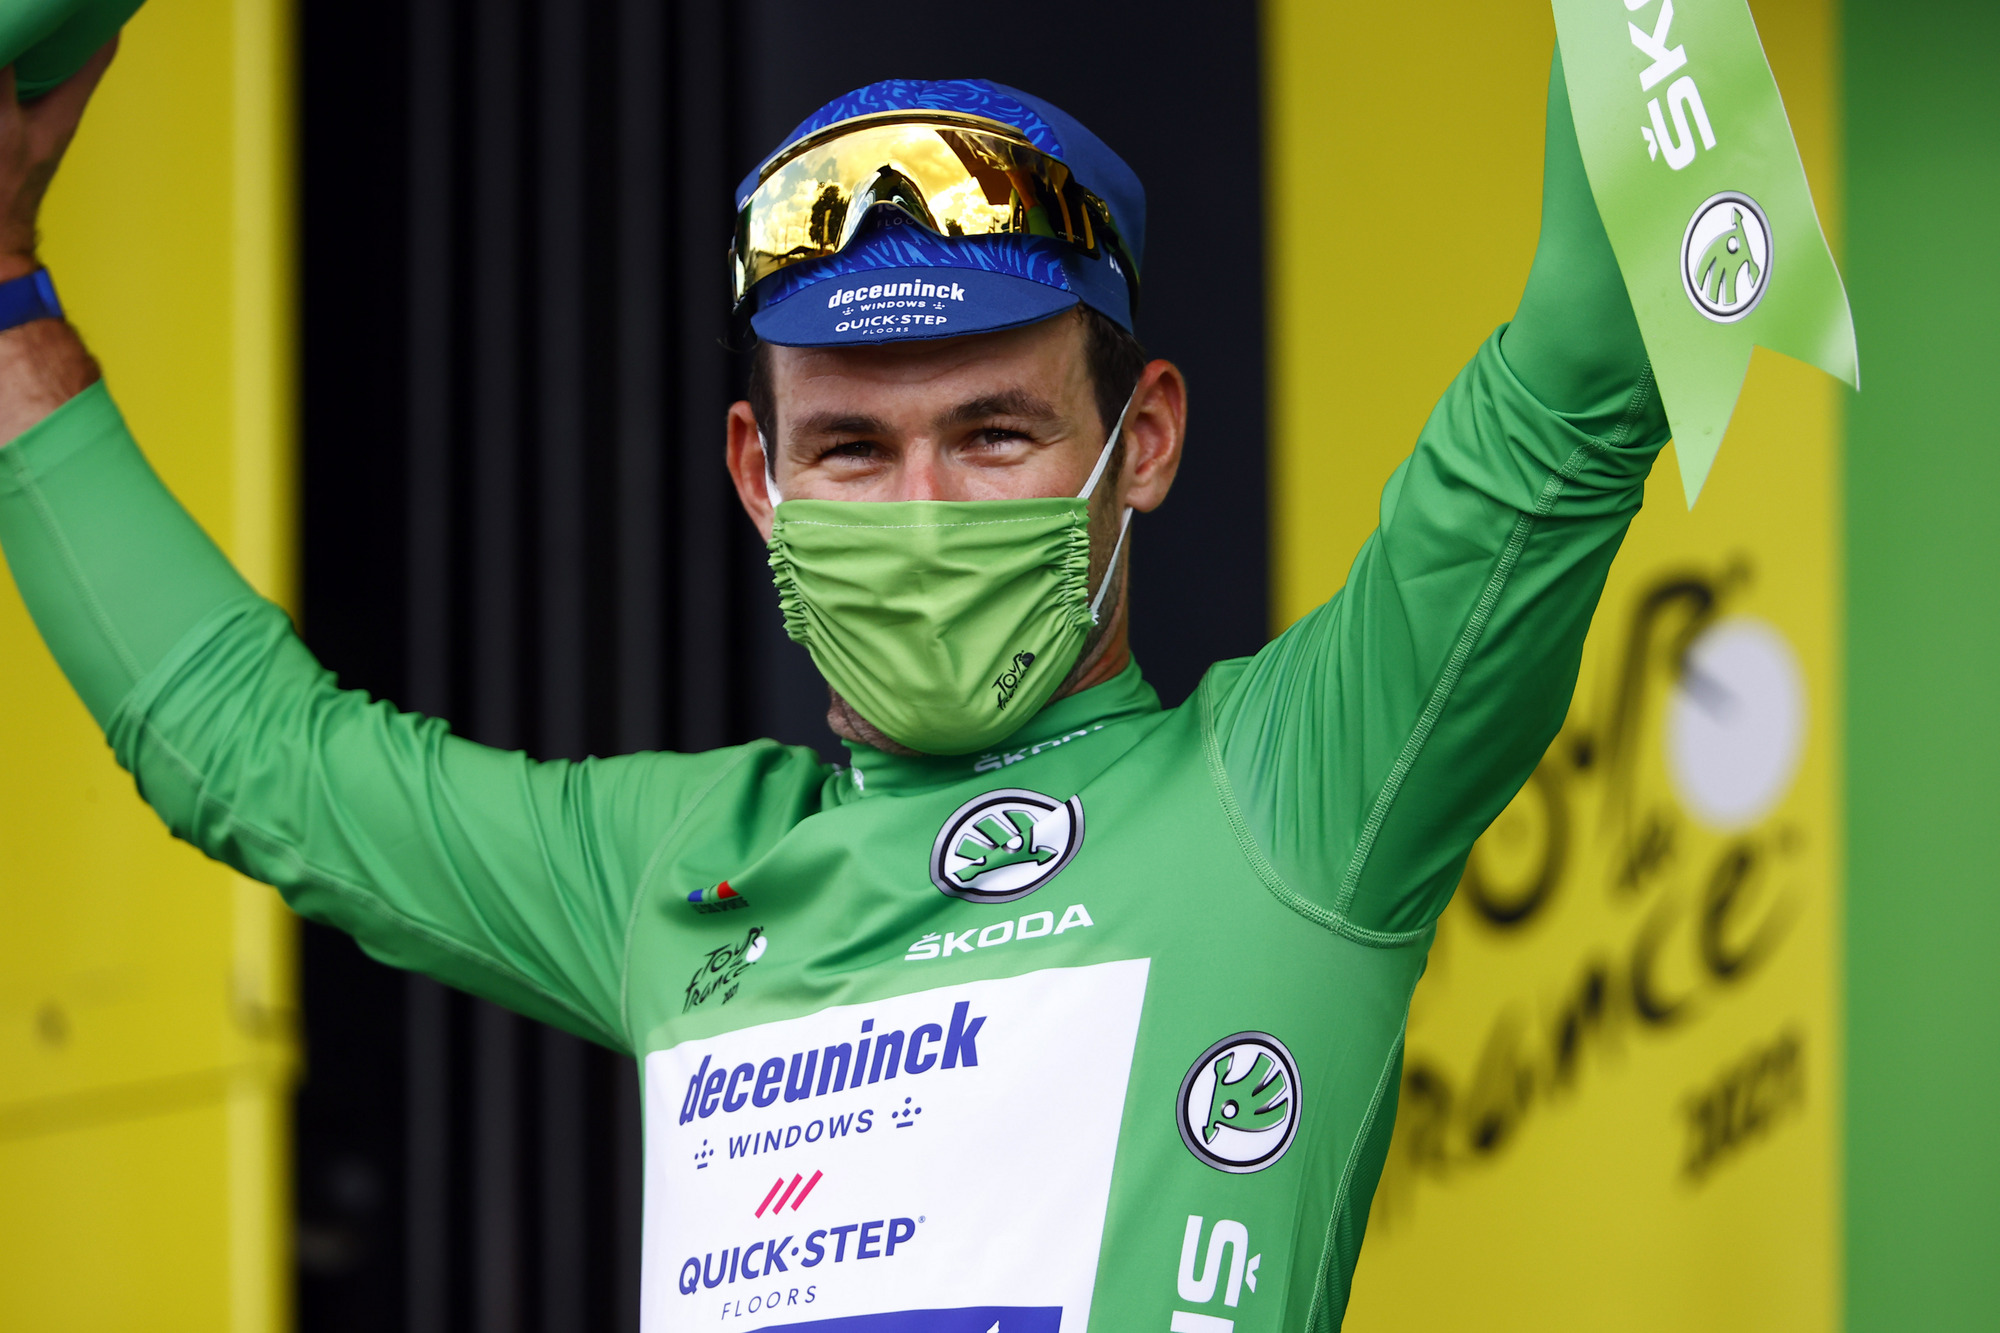 Tour de France 2021 - 108th Edition - 12th stage Saint-Paul-Trois-Chateaux - Nimes 159.4 km - 07/07/2021 - Mark Cavendish (GBR - Deceuninck - Quick-Step) - photo Luca Bettini/BettiniPhoto©2021